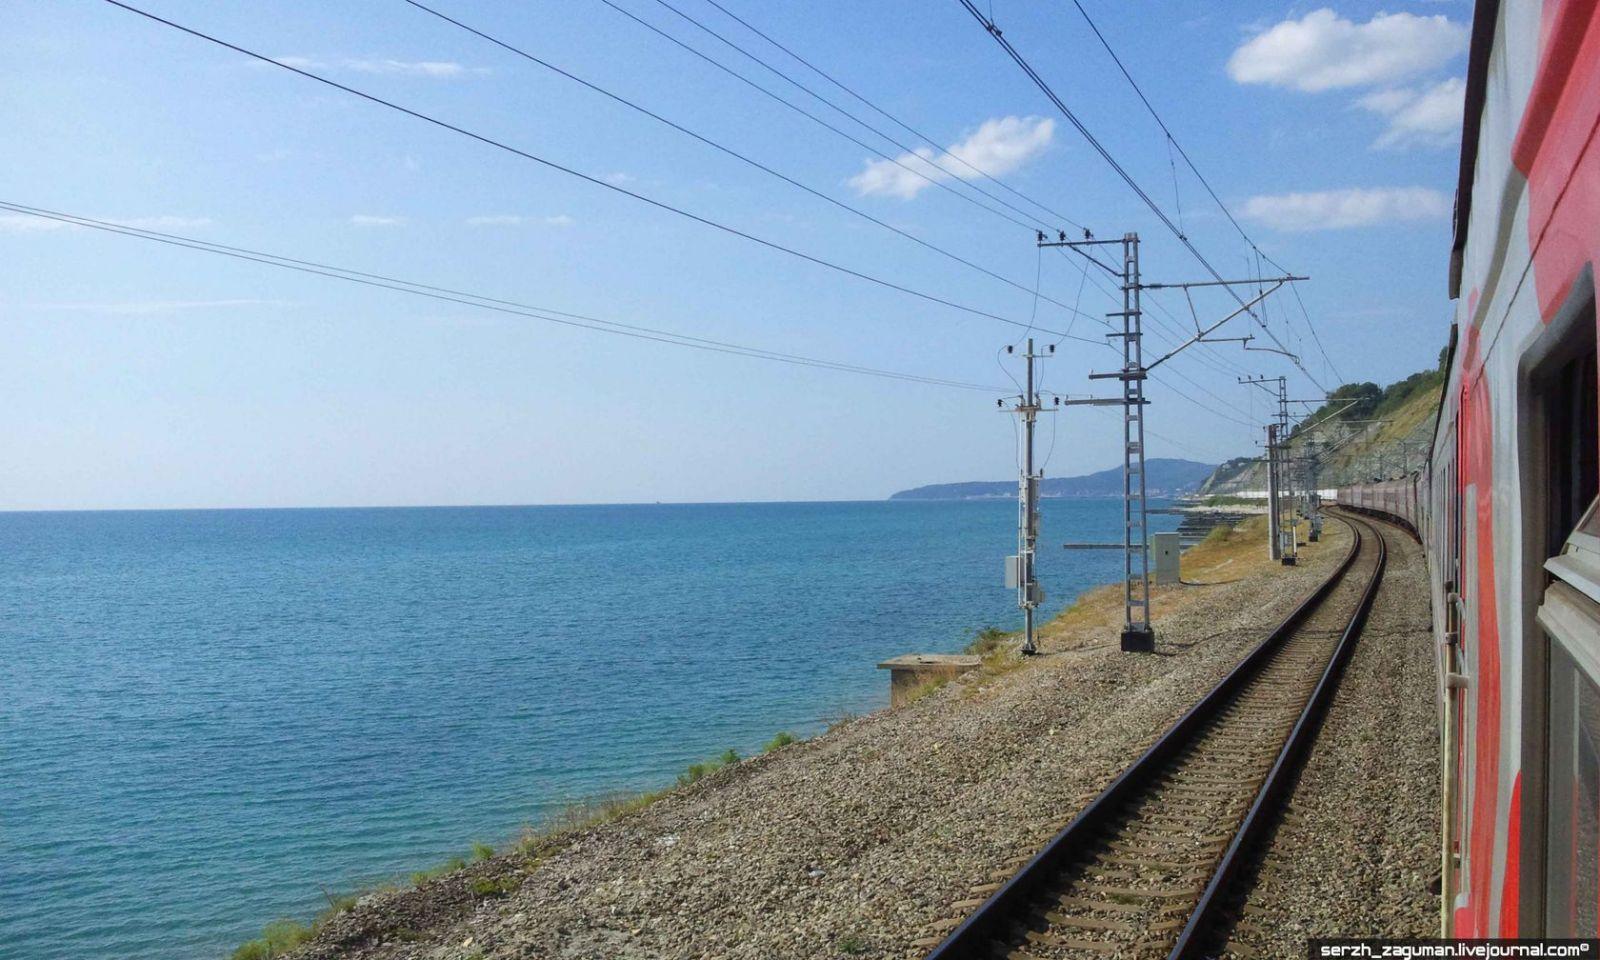 Дорога к морю. Узбекистан, Афганистан и Пакистан решили строить железную дорогу